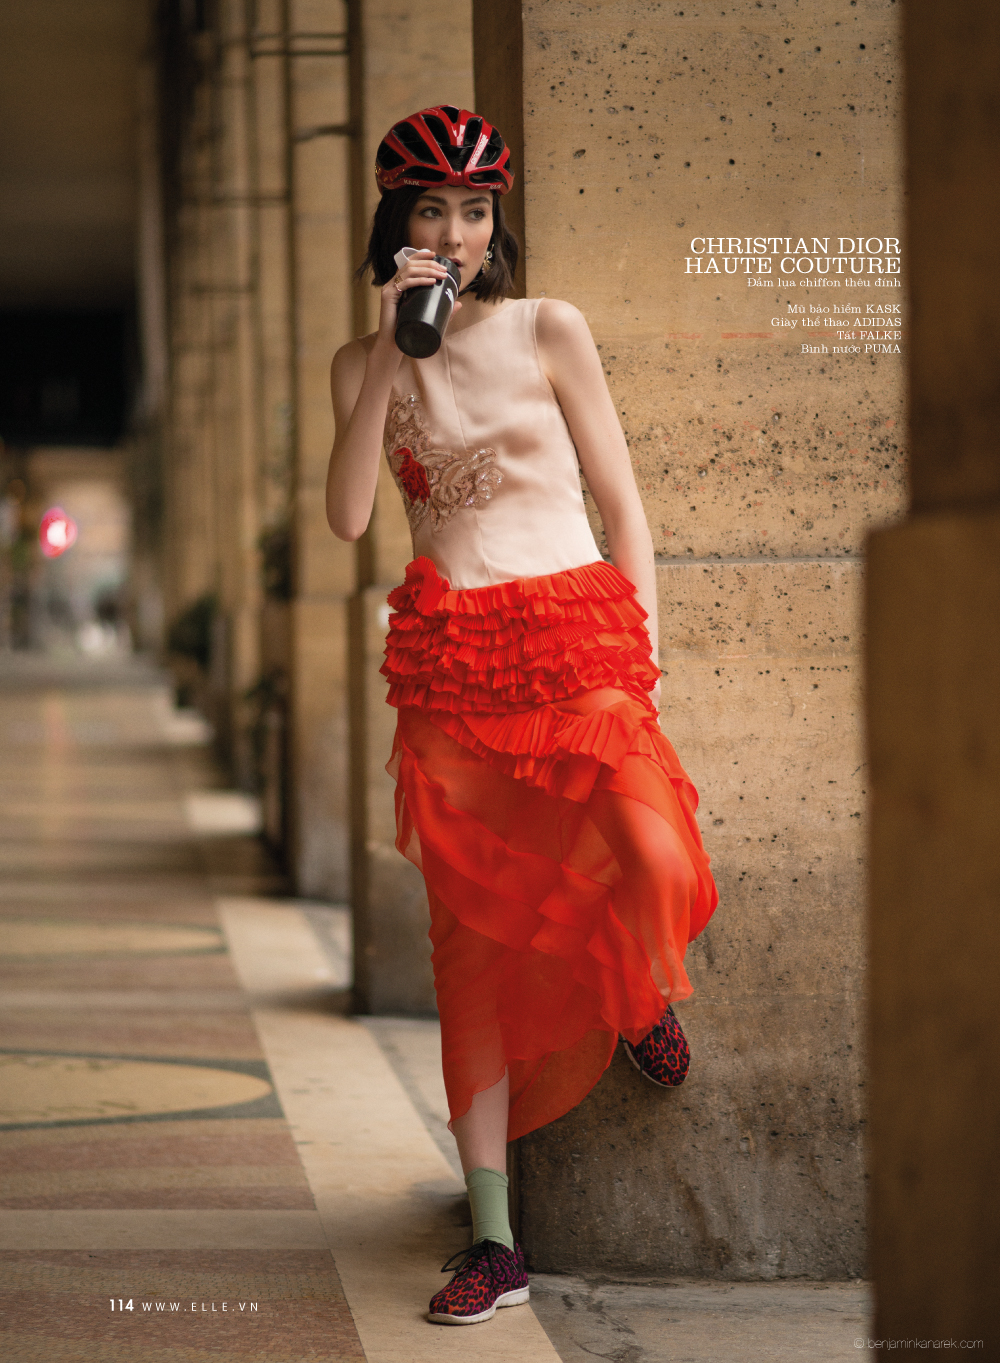 Mar Gonzalez in Christian Dior © Benjamin Kanarek